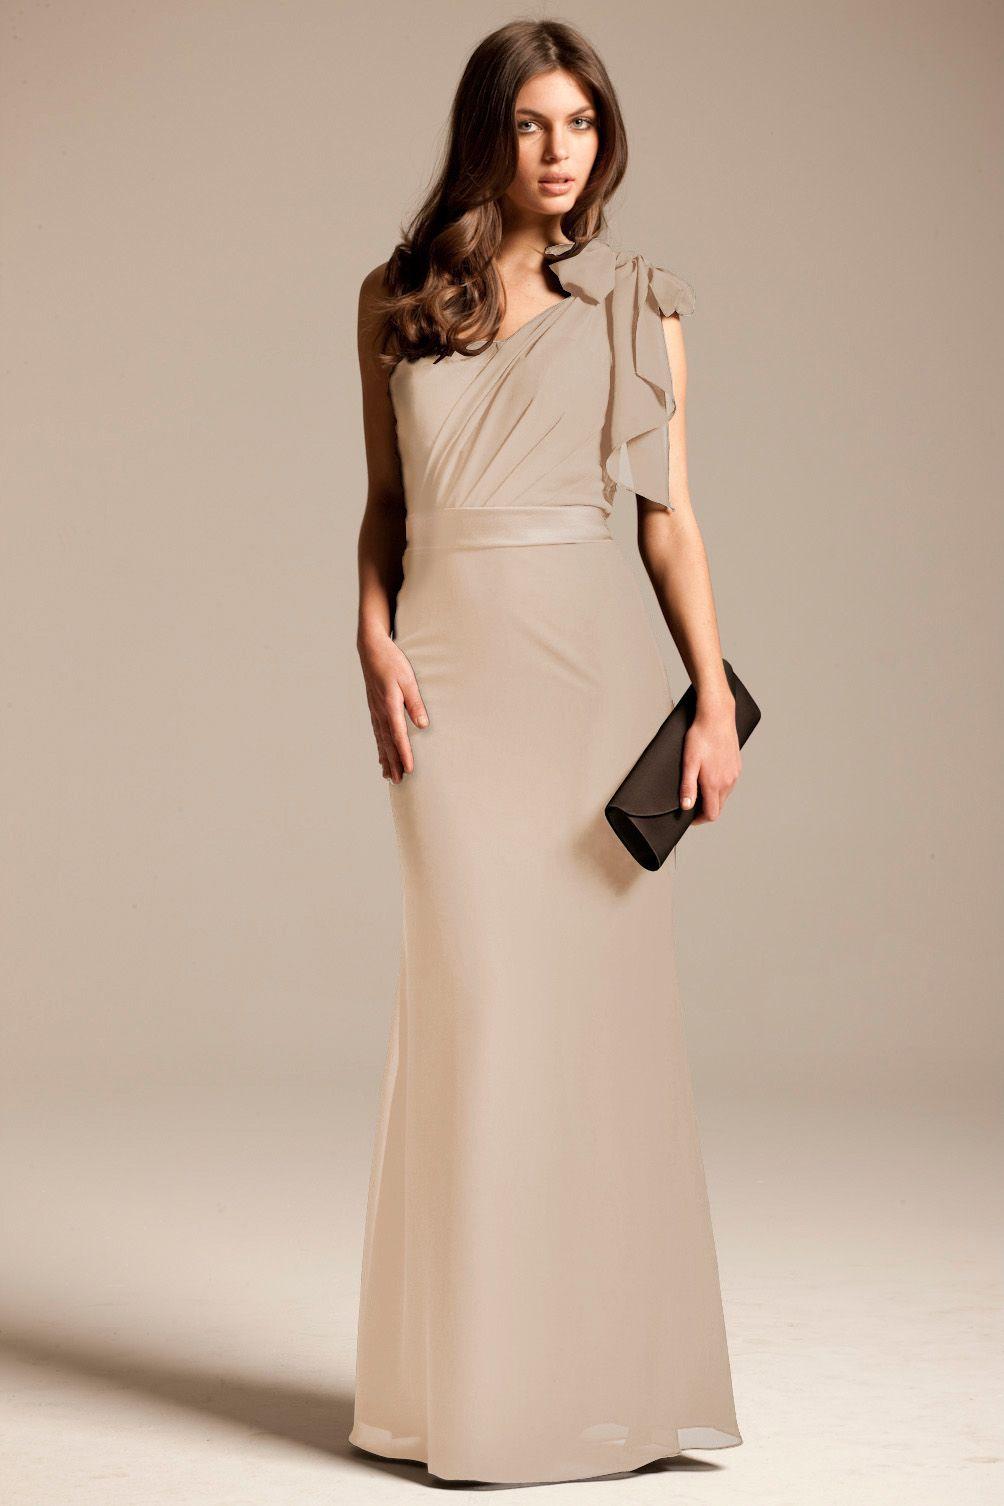 ed3ab7007c356 Jessica #bridesmaid #dresses in Champagne by Natasha Millani http://www.